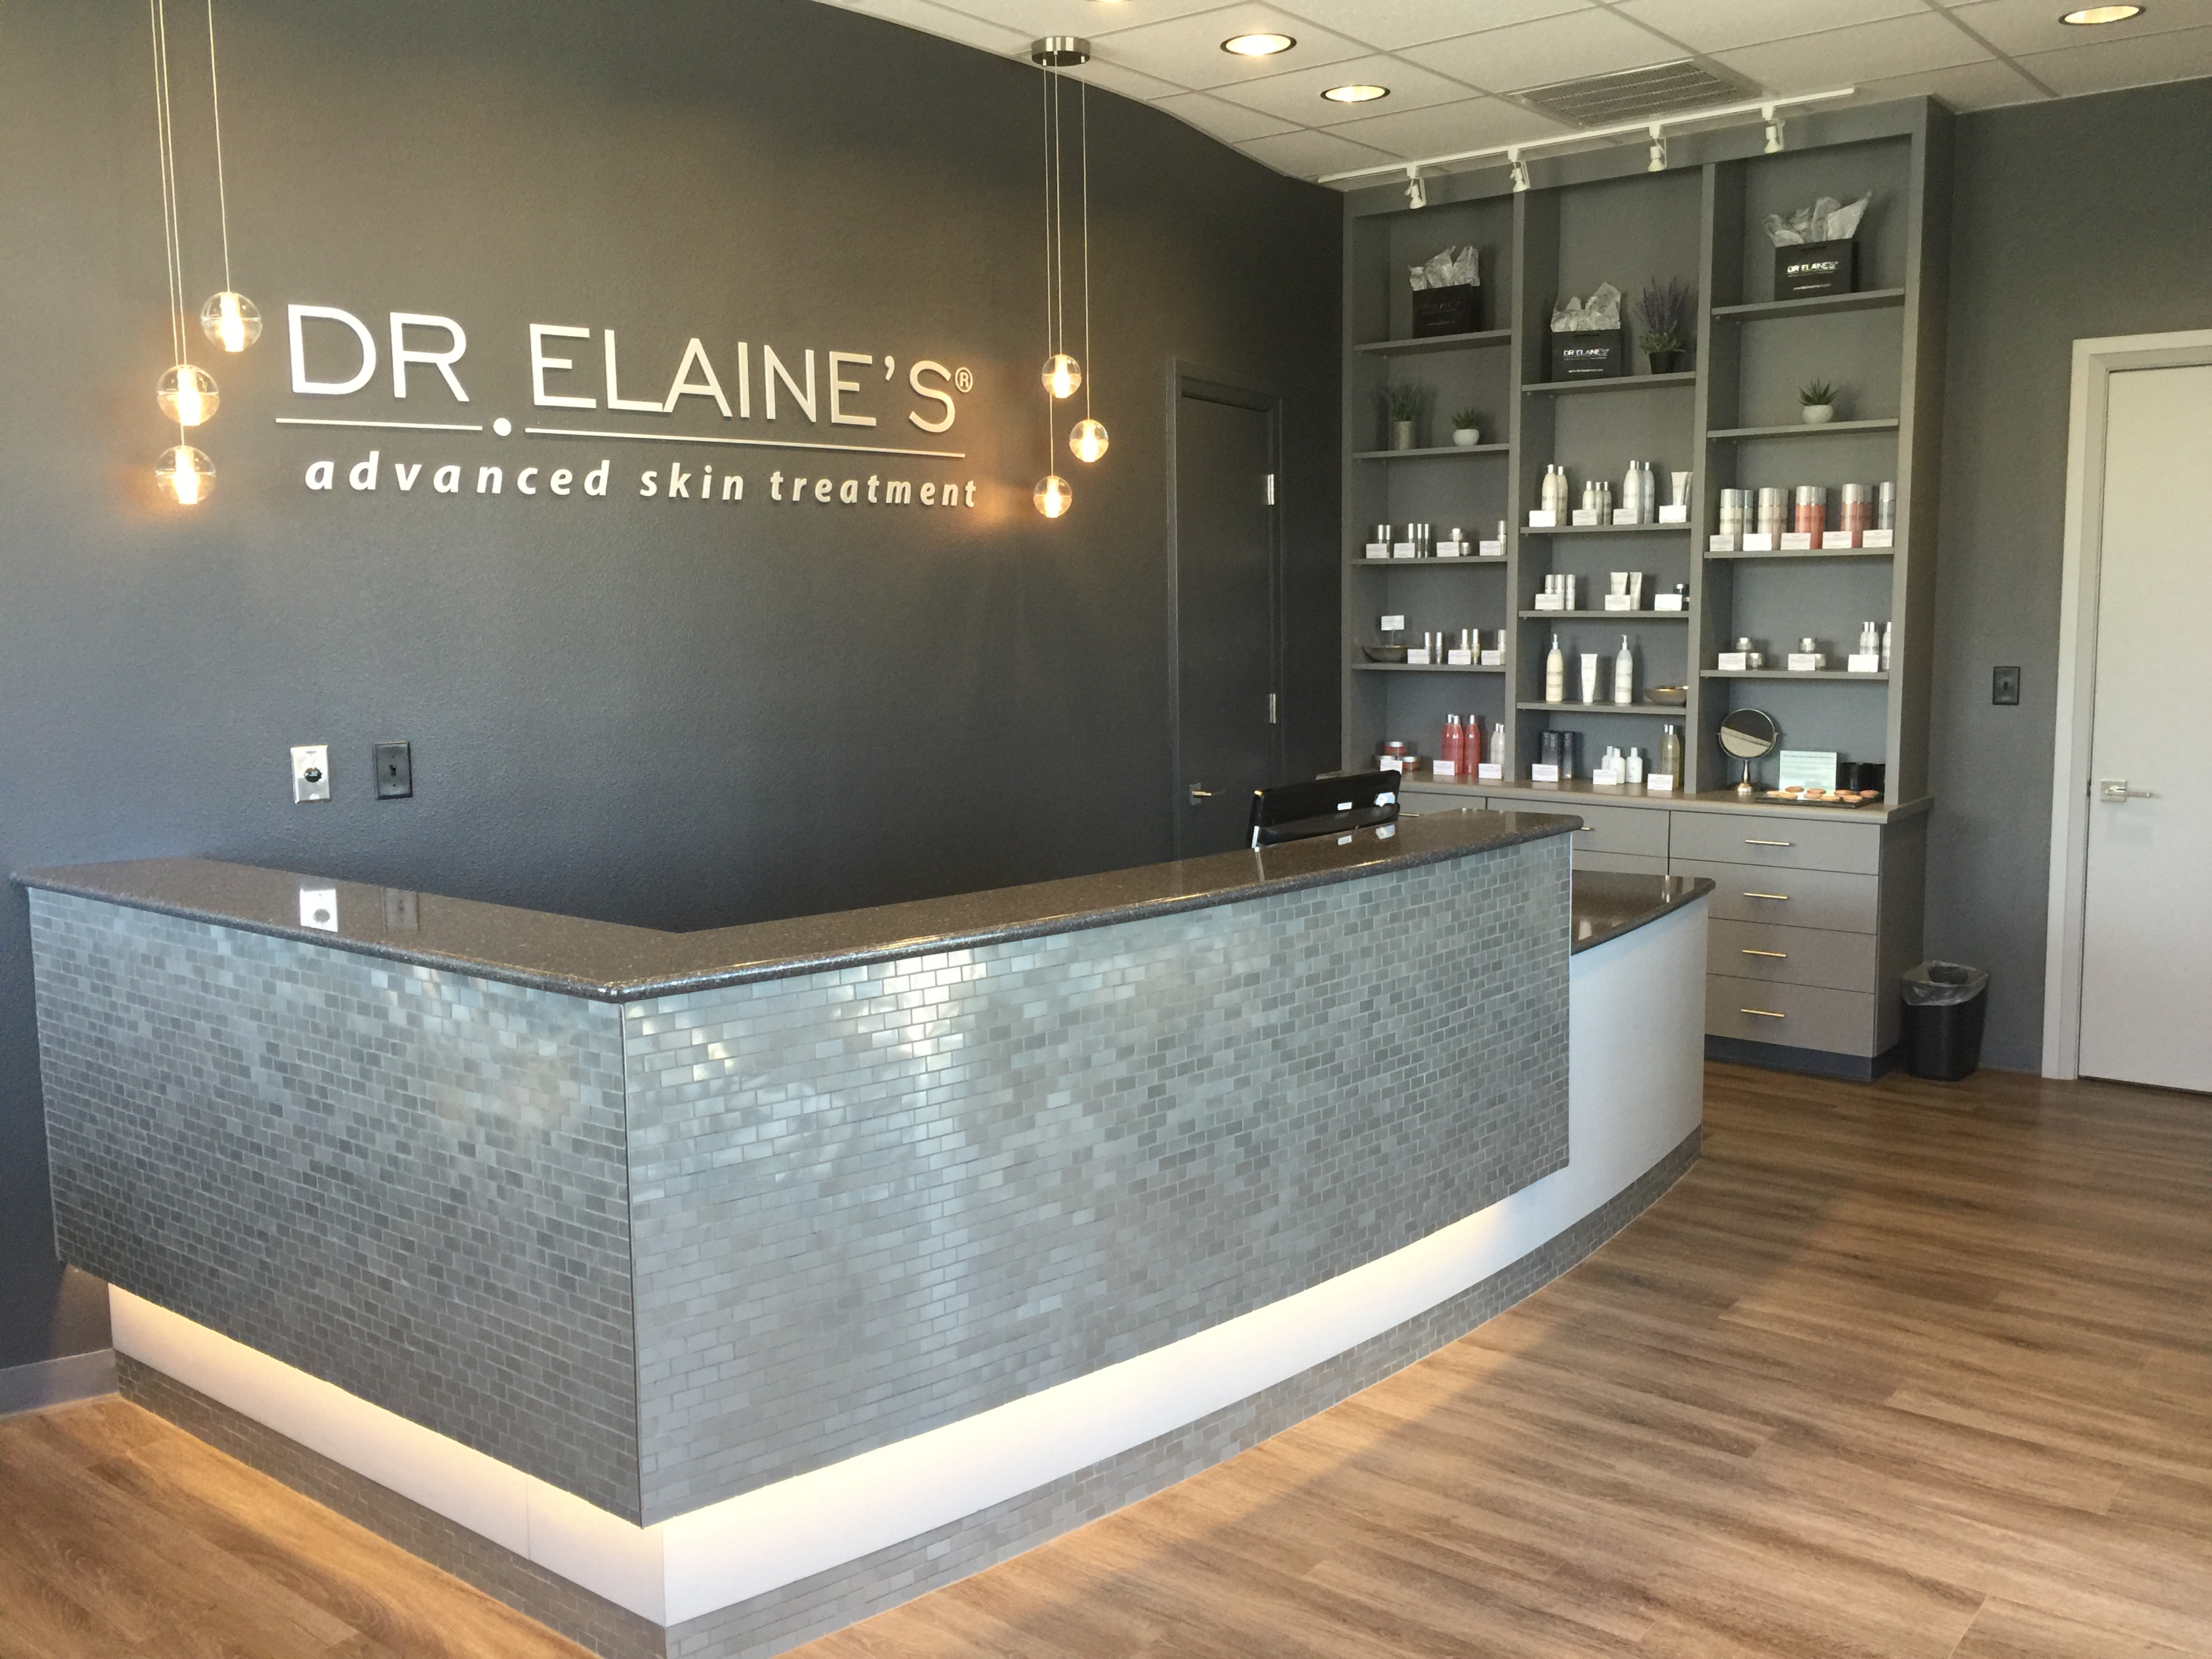 Elaine Cook MD, Advanced Skin Treatment Center image 0